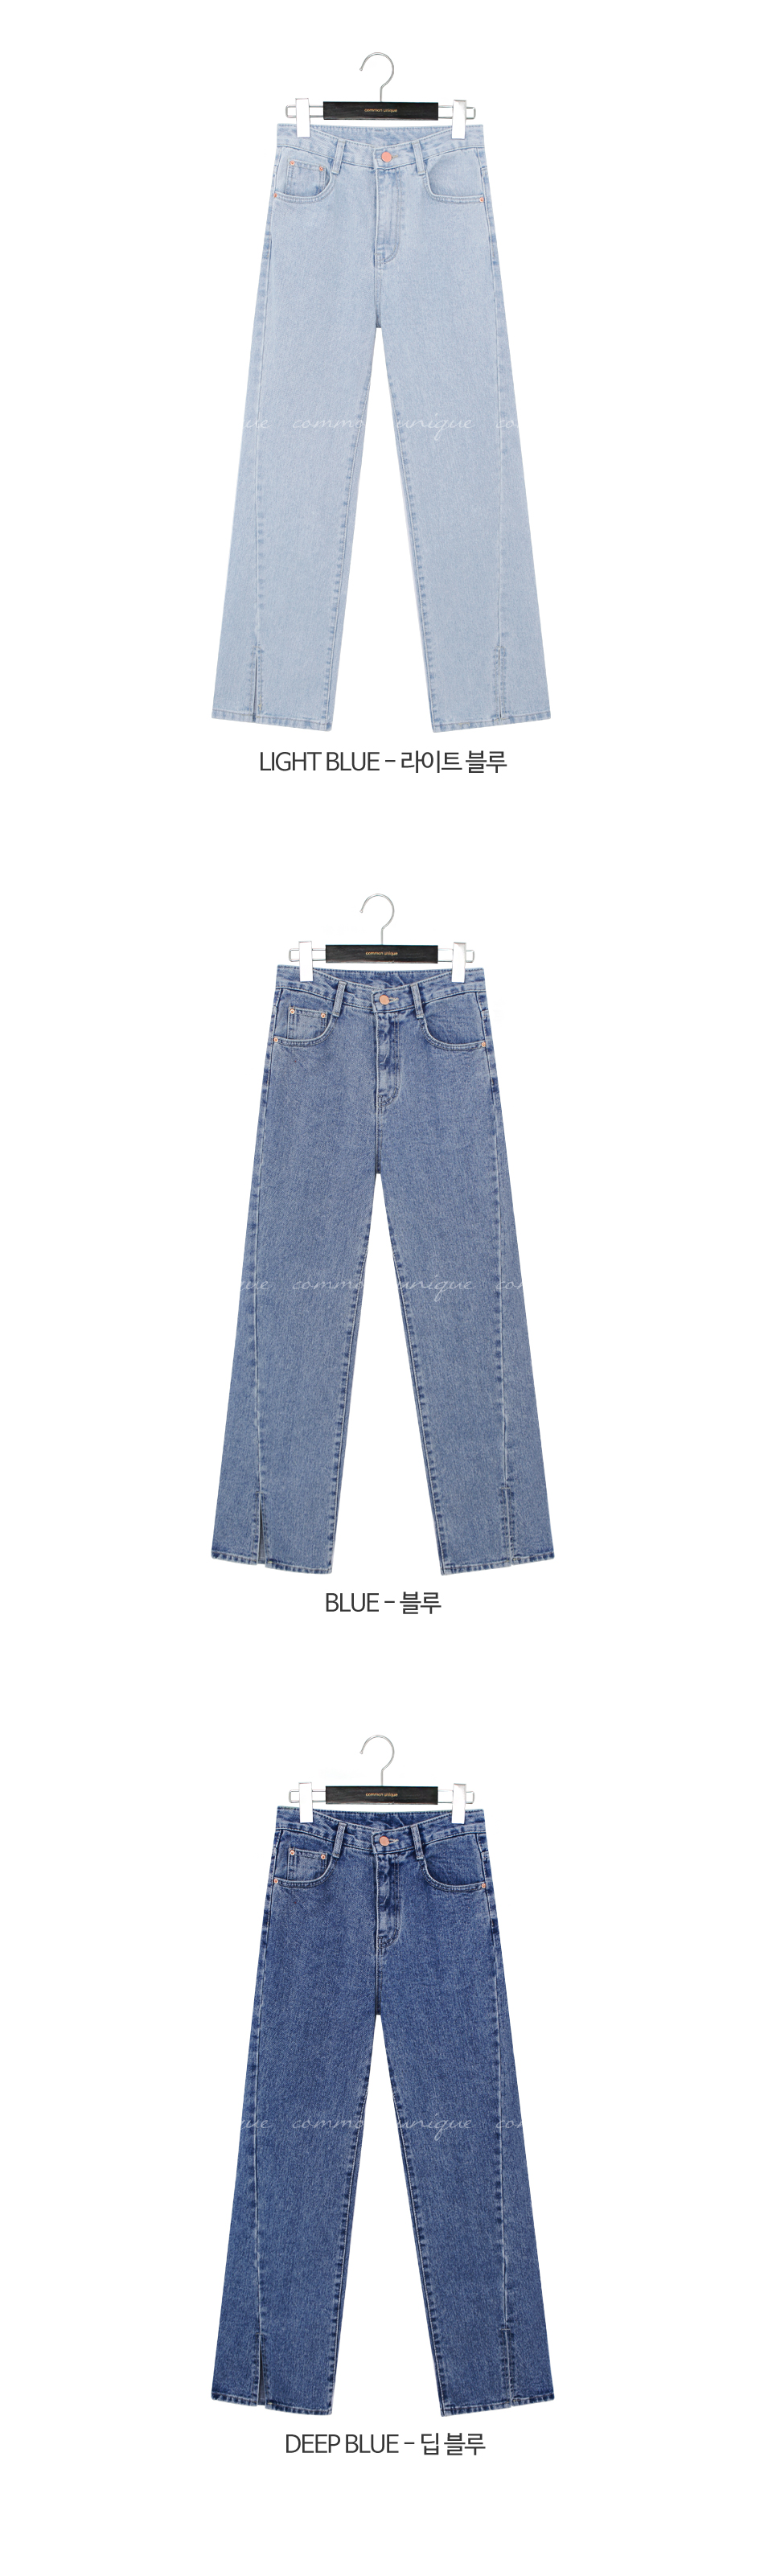 Asymmetrical Seam Jeans